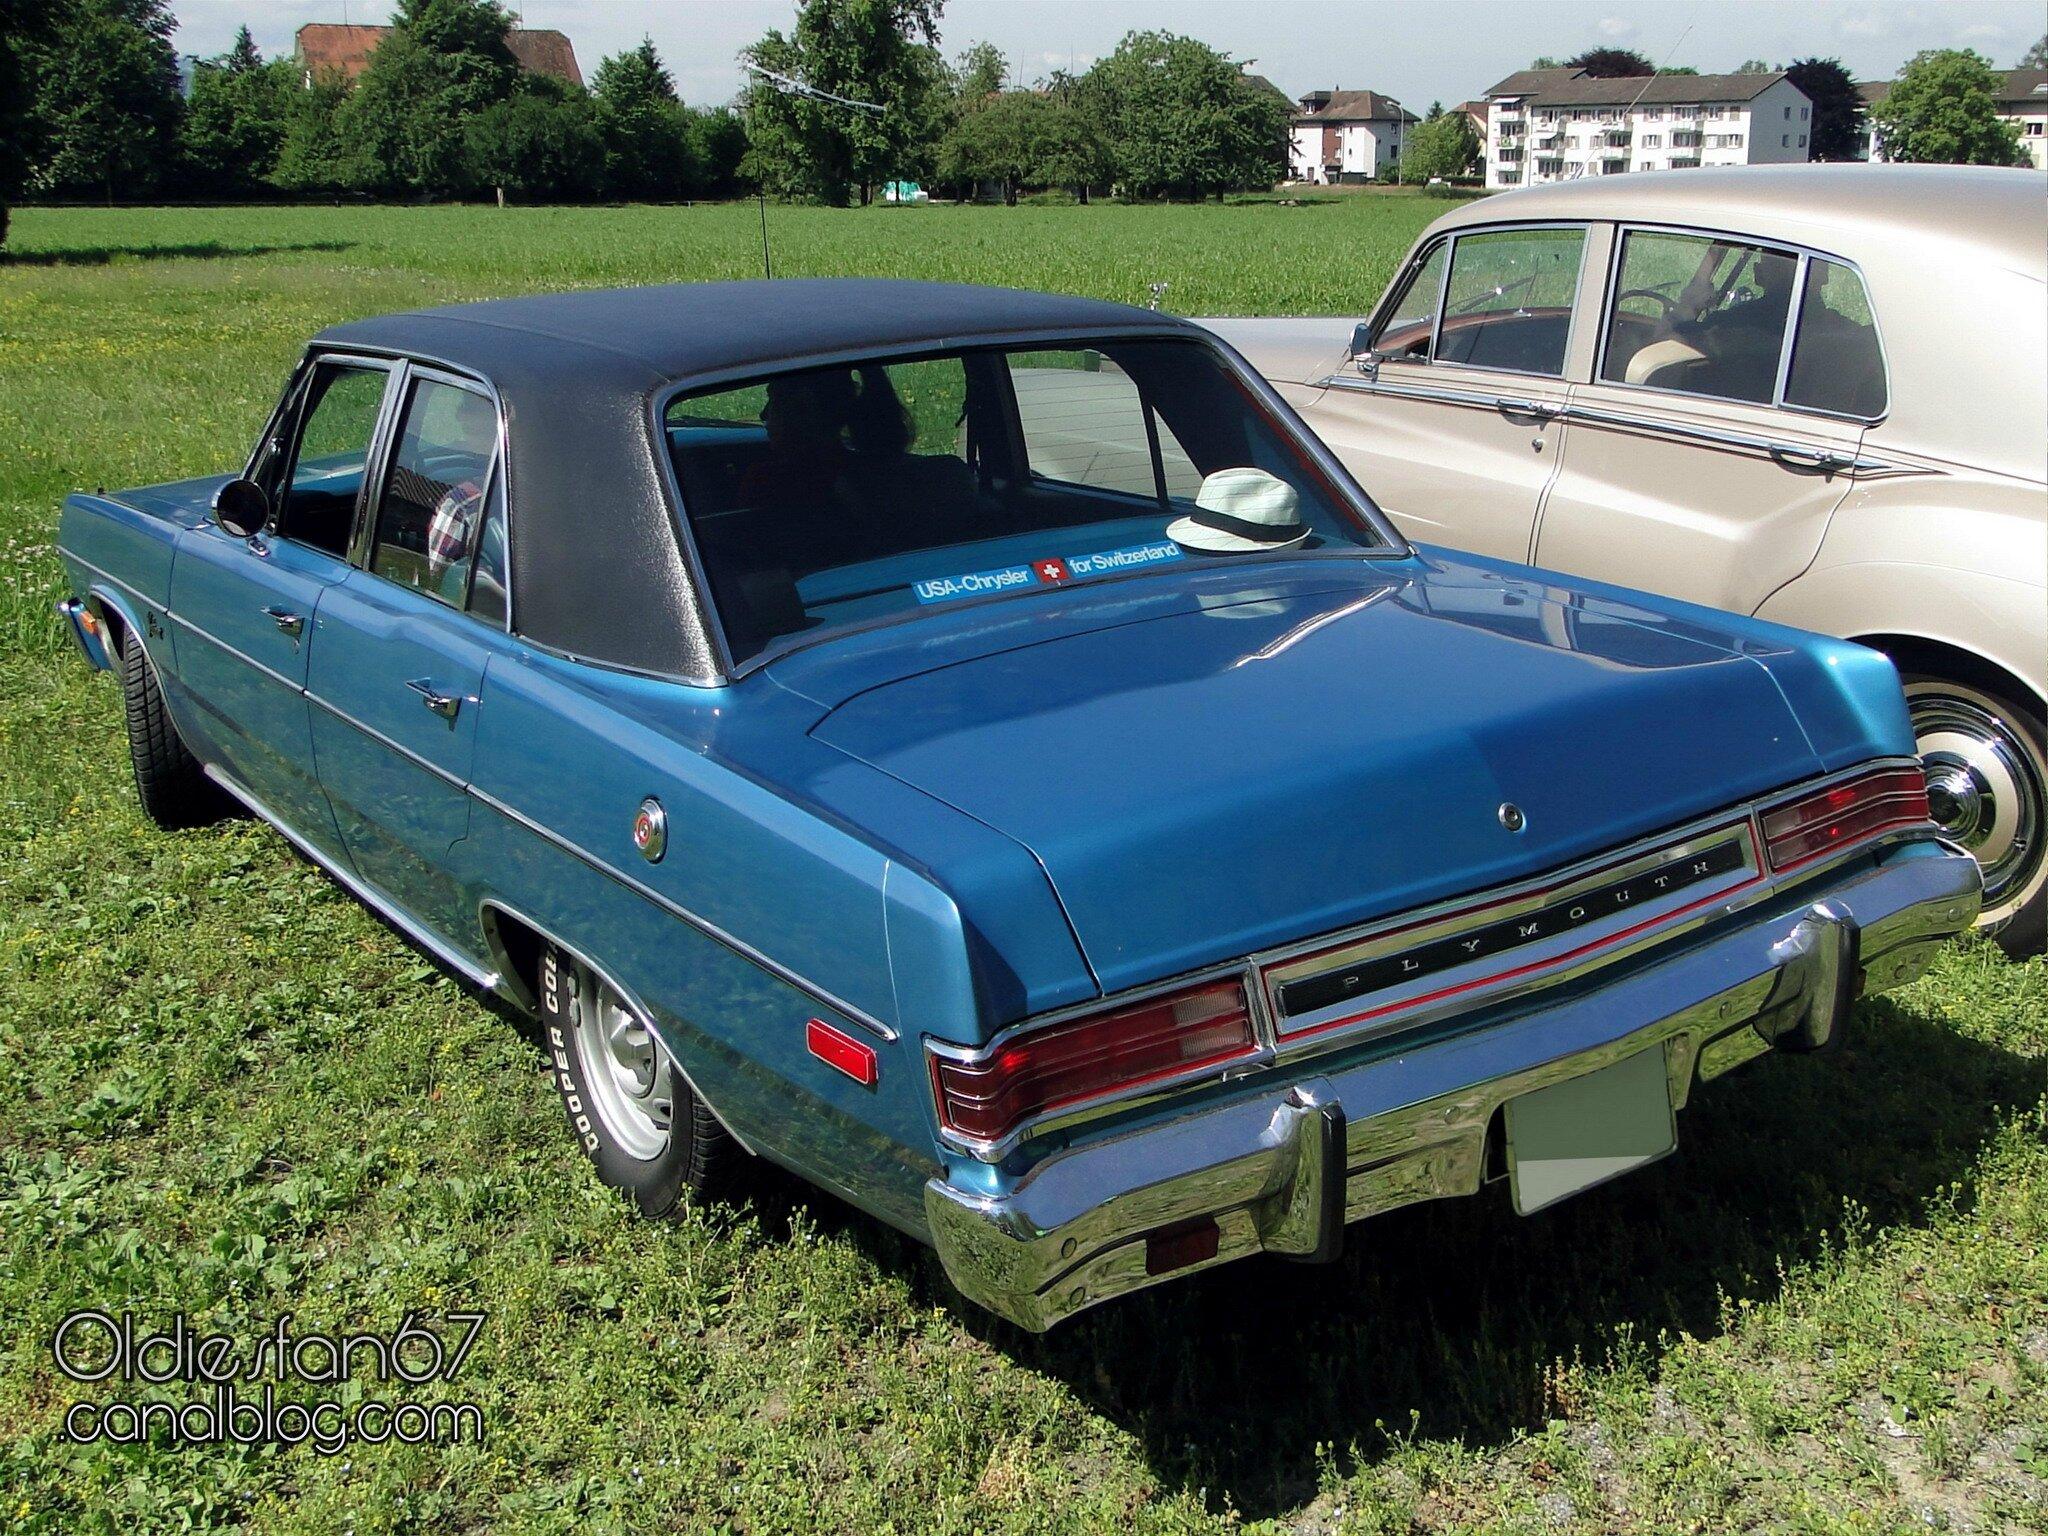 "Plymouth Valiant 4door sedan-1974 - Oldiesfan67 ""Mon blog ..."